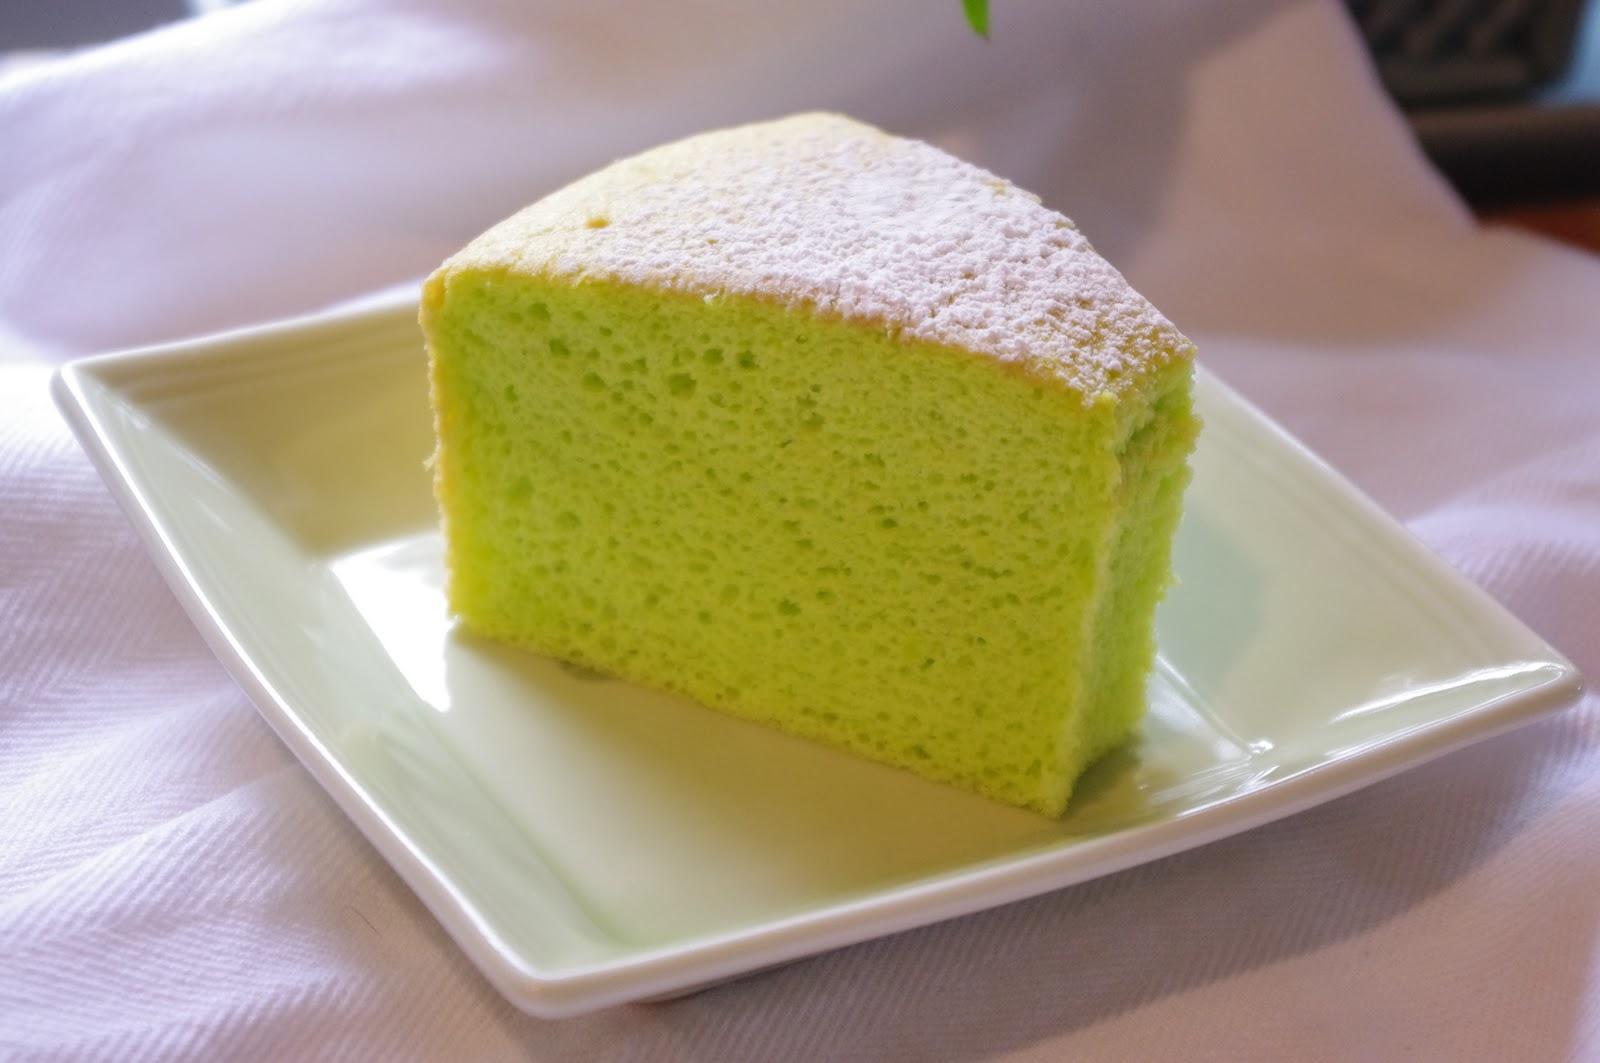 foodesign: pandan chiffon cake